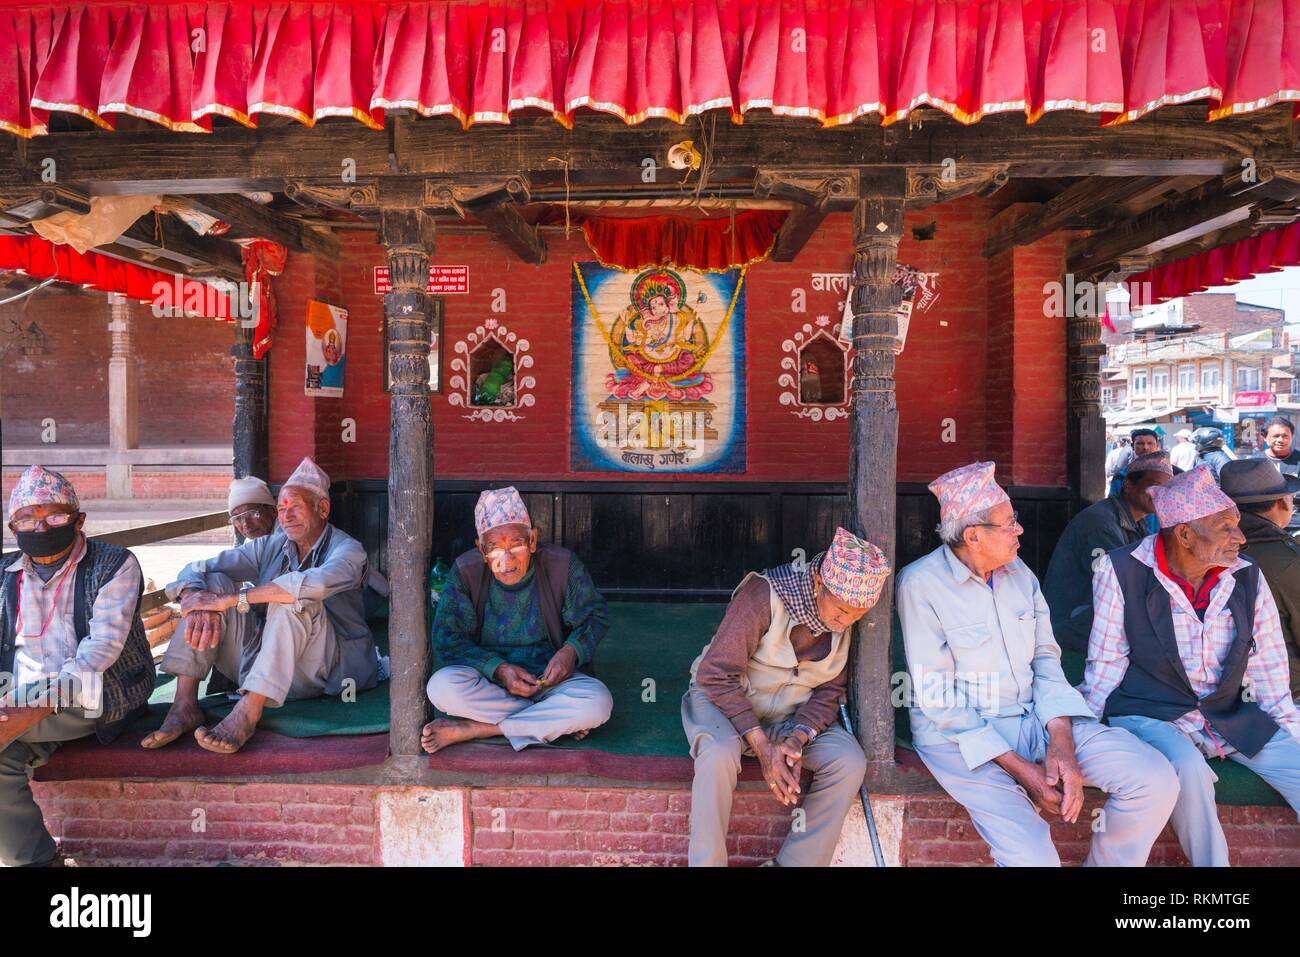 Pashupatinath Temple, Bagmati River, Kathmandu Valley, Nepal, Asia, Unesco World Heritage Site. - Stock Image